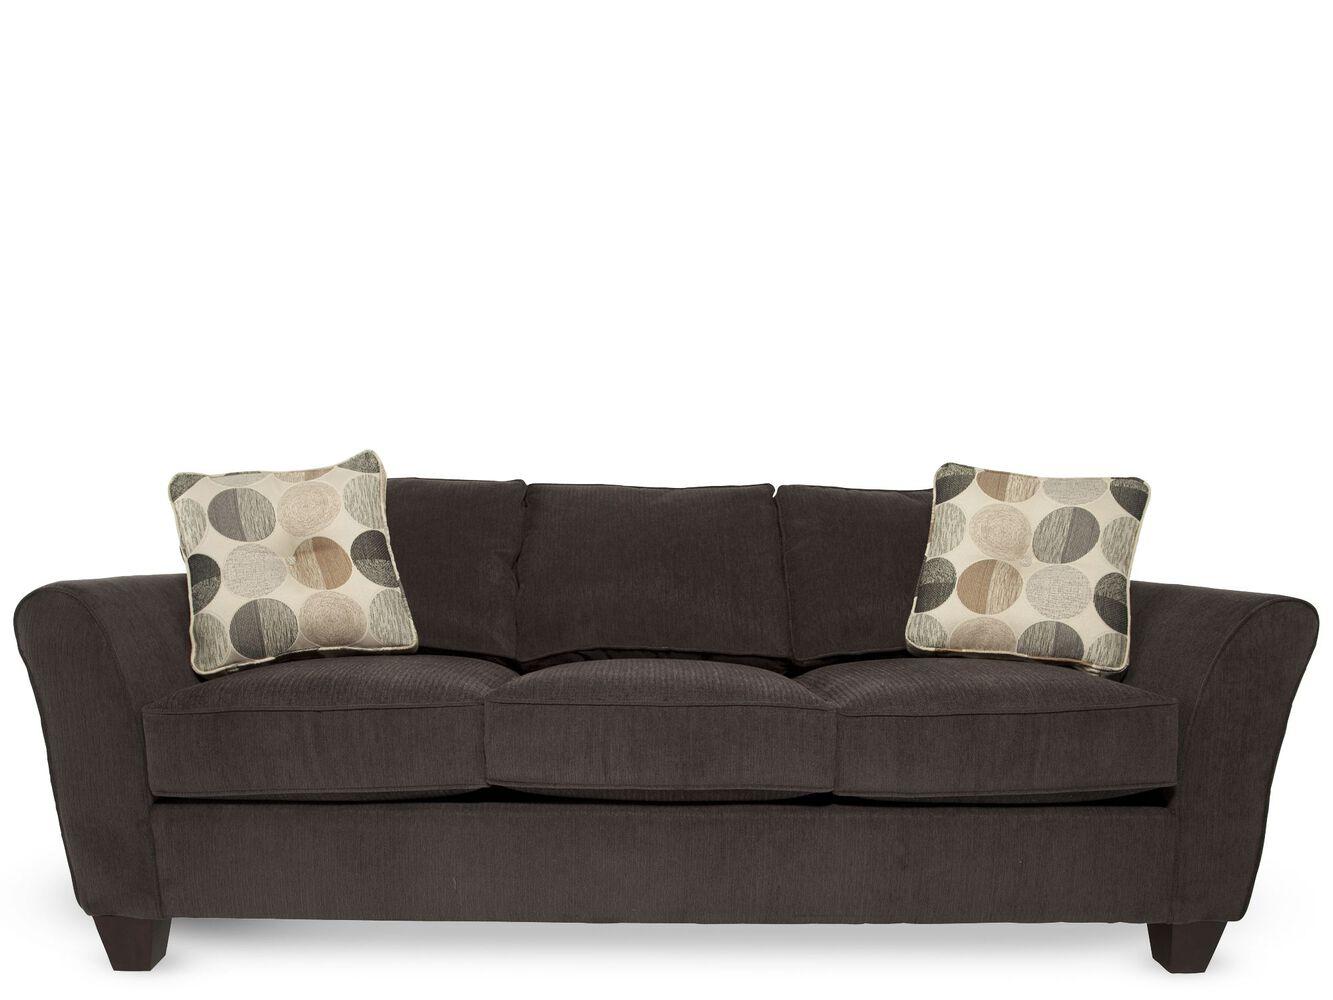 Broyhill Maddie Sofa Mathis Brothers Furniture